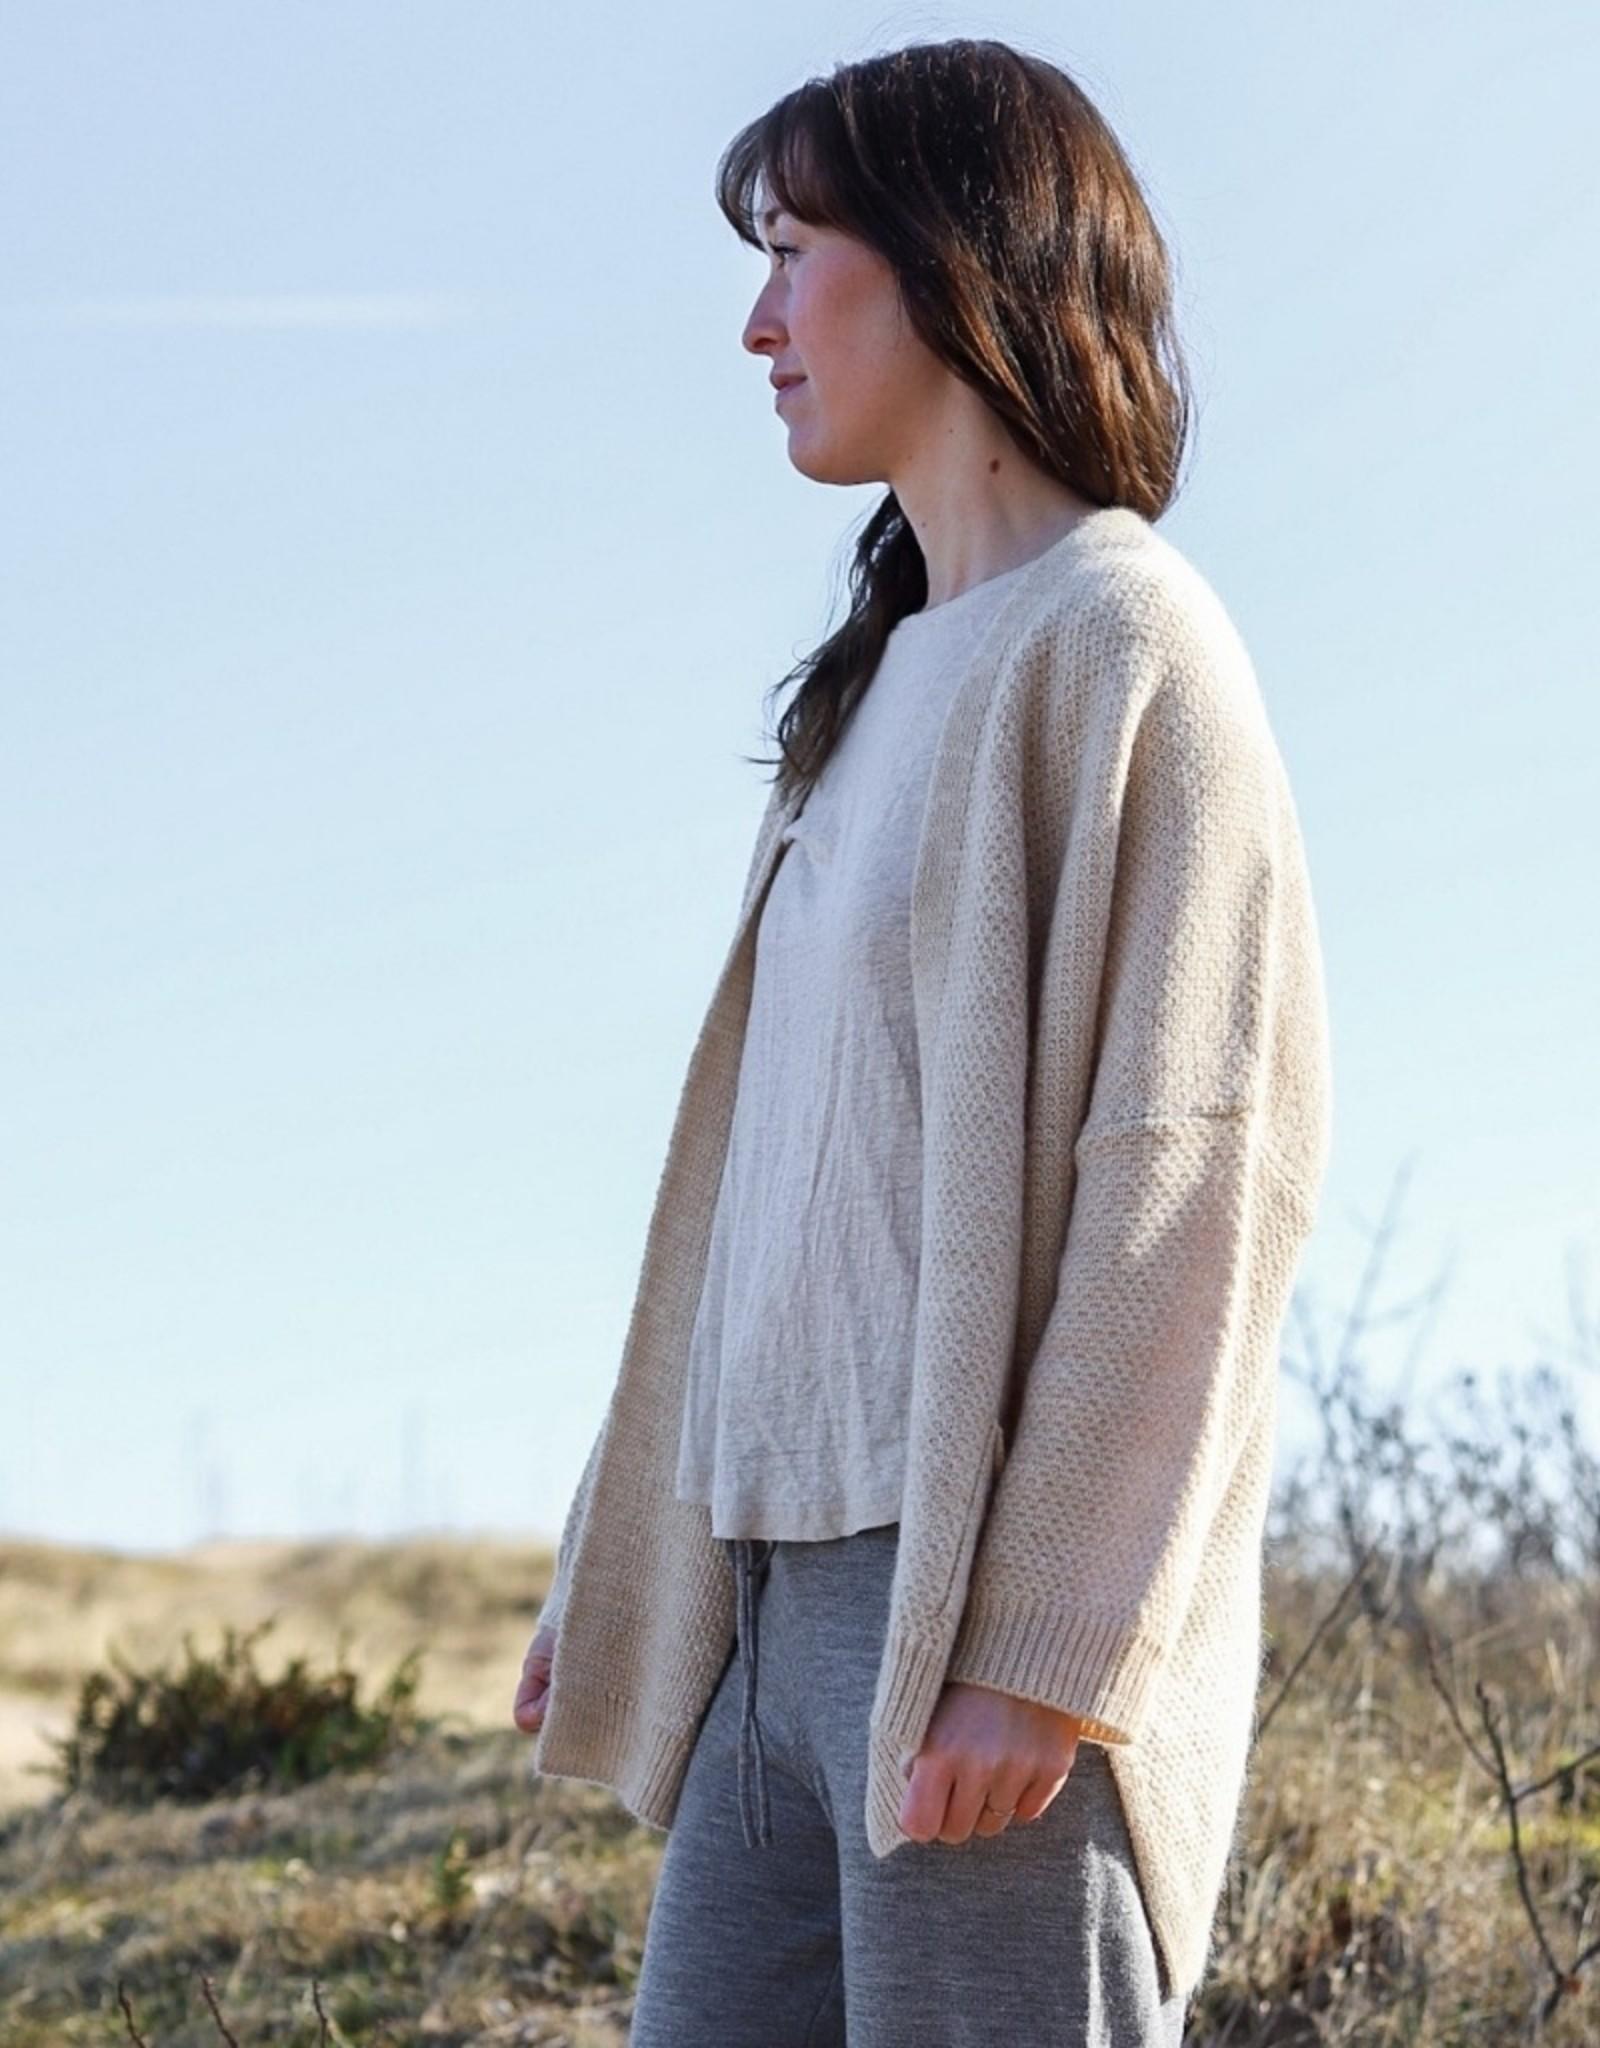 Gai&Lisva Charlotte Knit Cardigan - Nougat